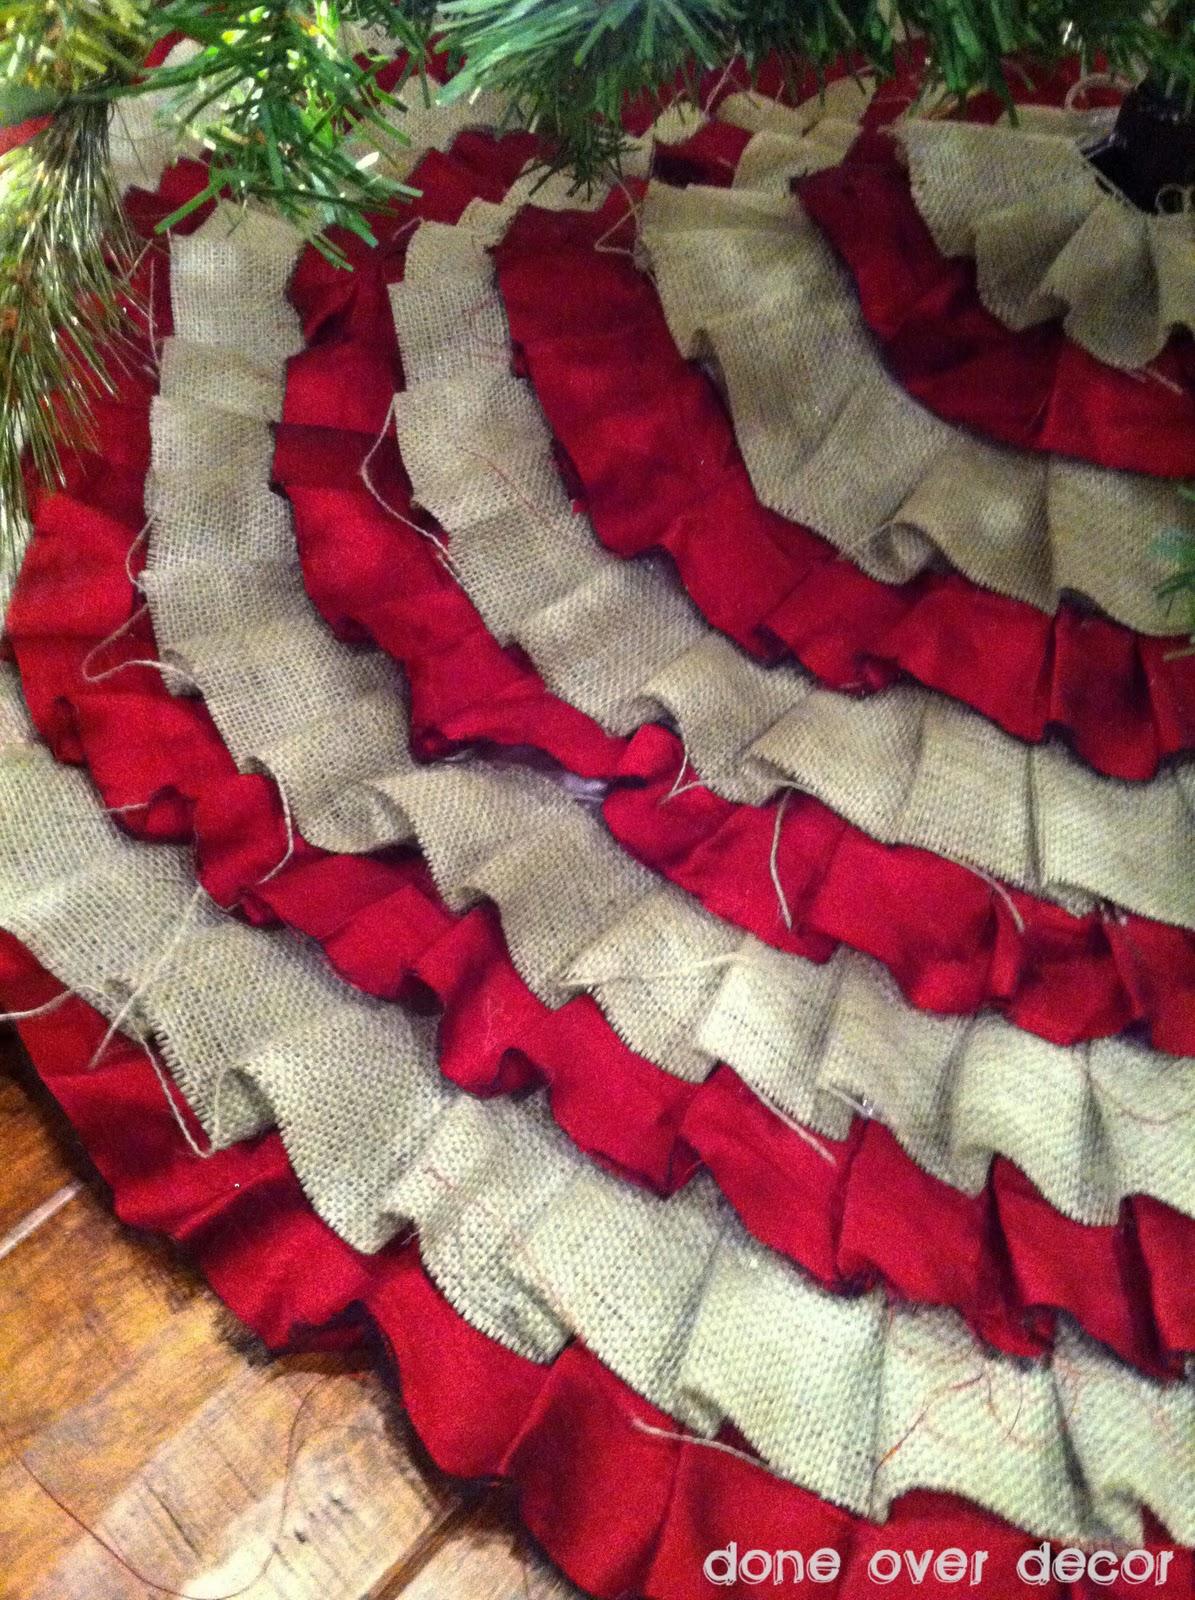 DIY Ruffle Tree Skirt – No sewing! Rustic chic!